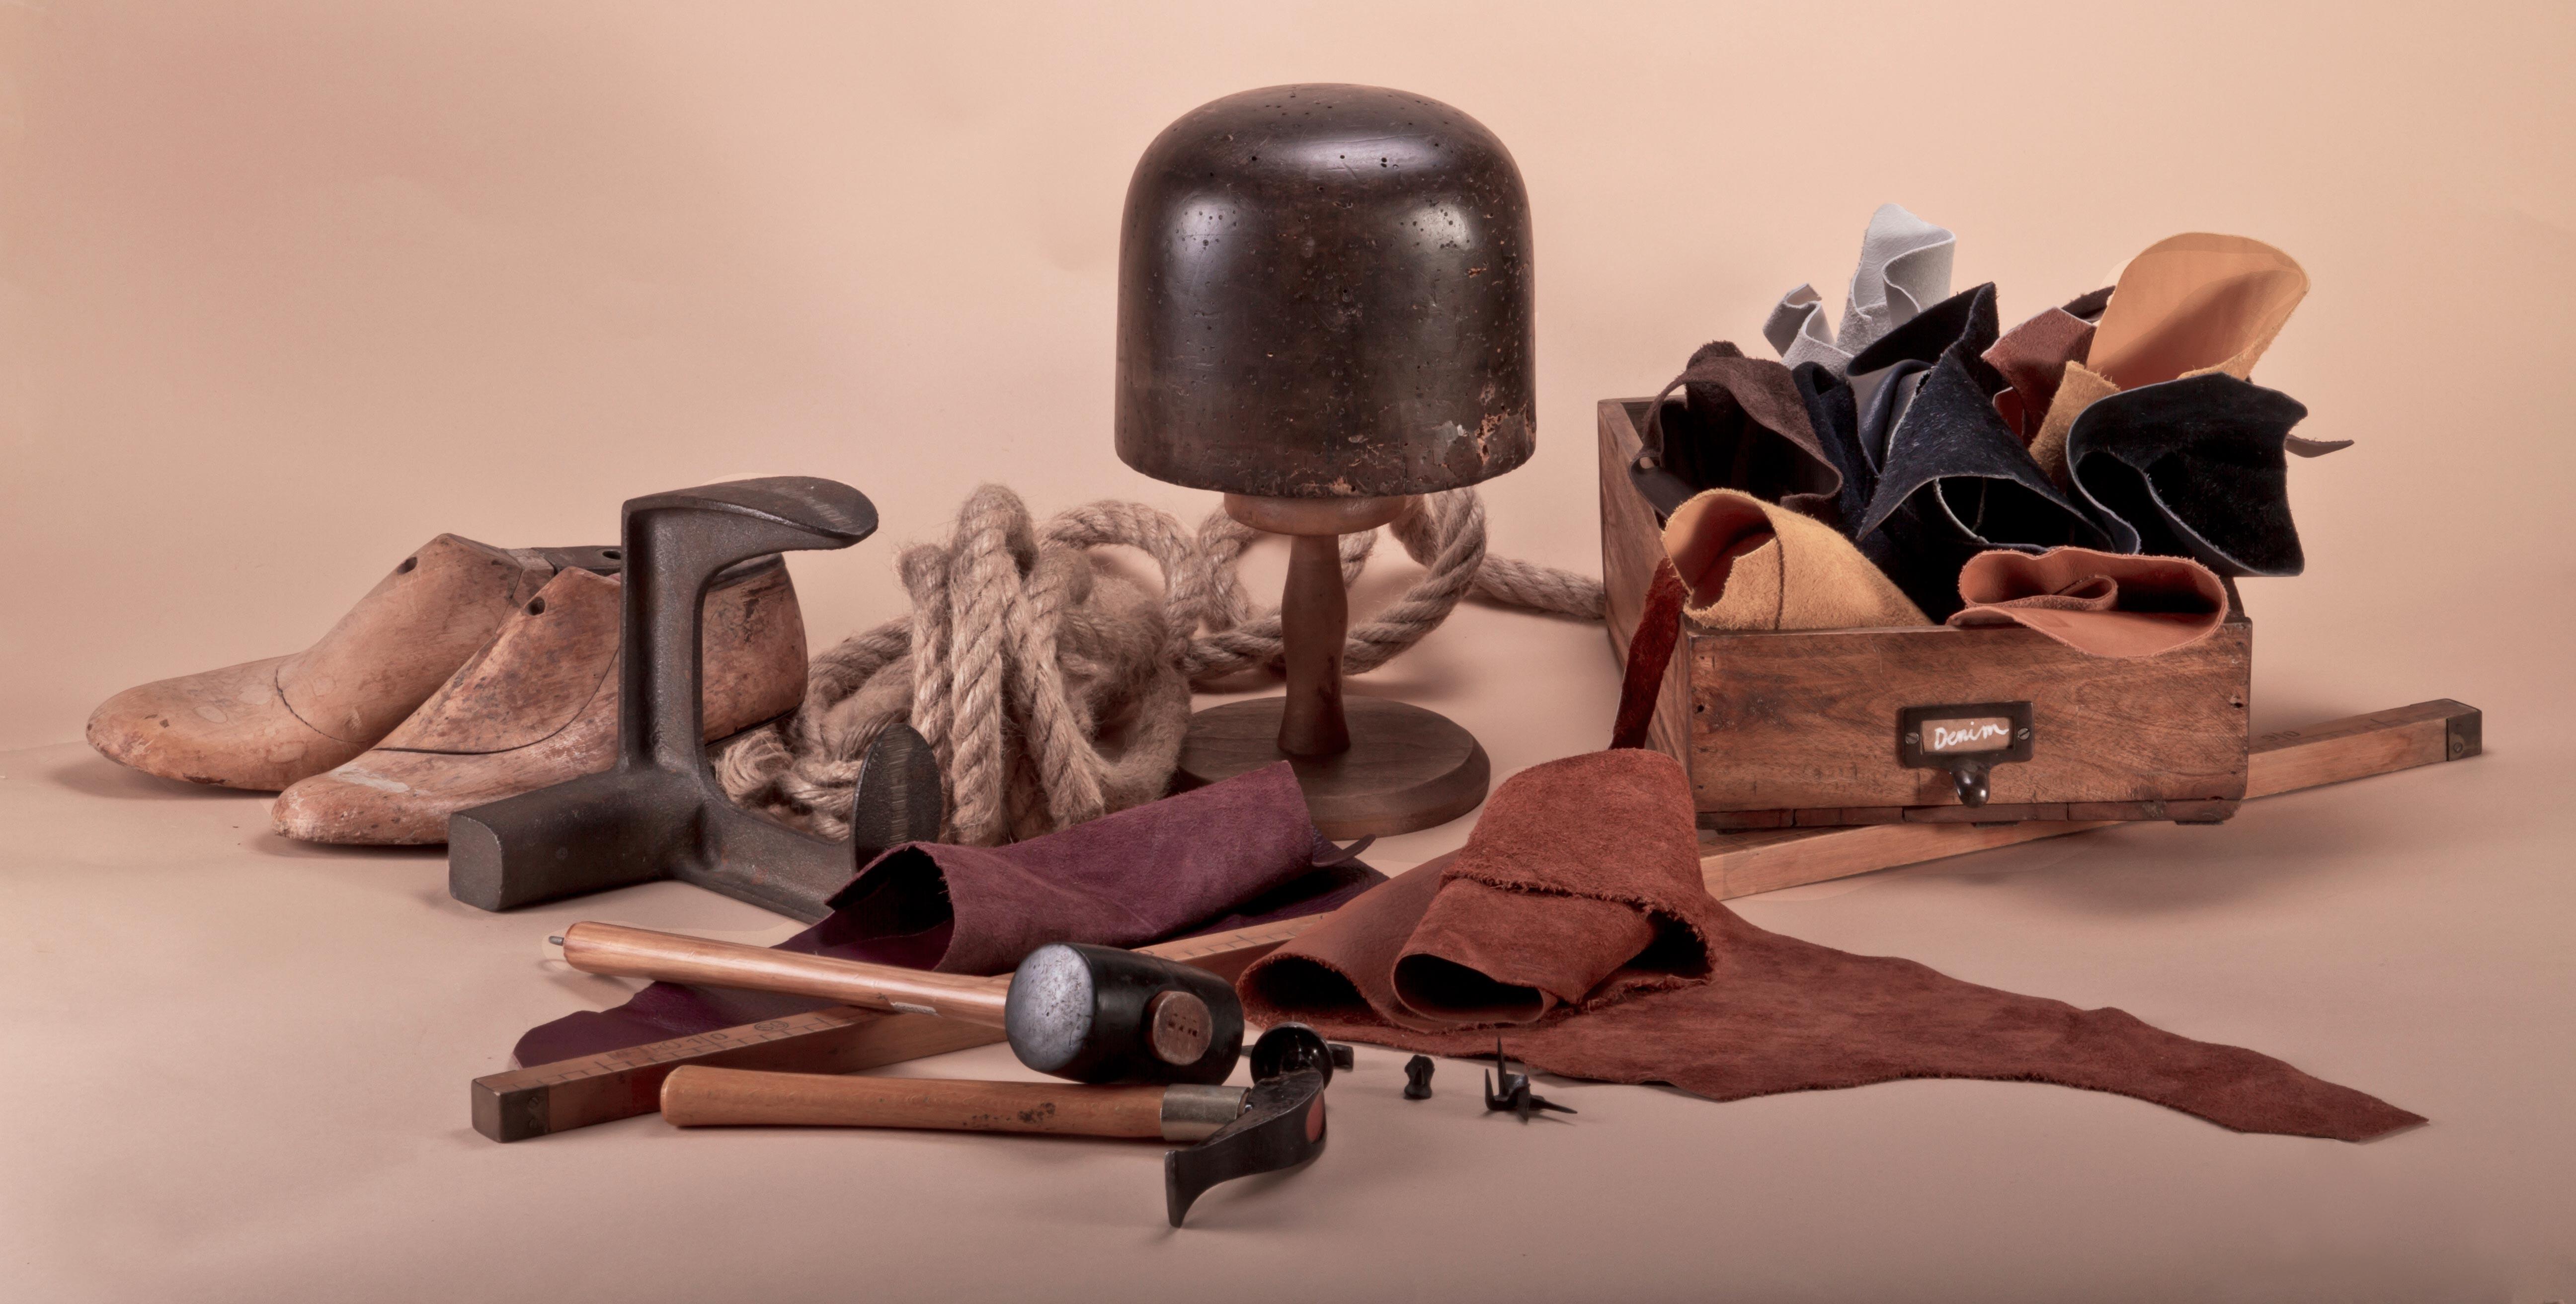 Scarpe-capi-e-accessori-moda-unici-Derna